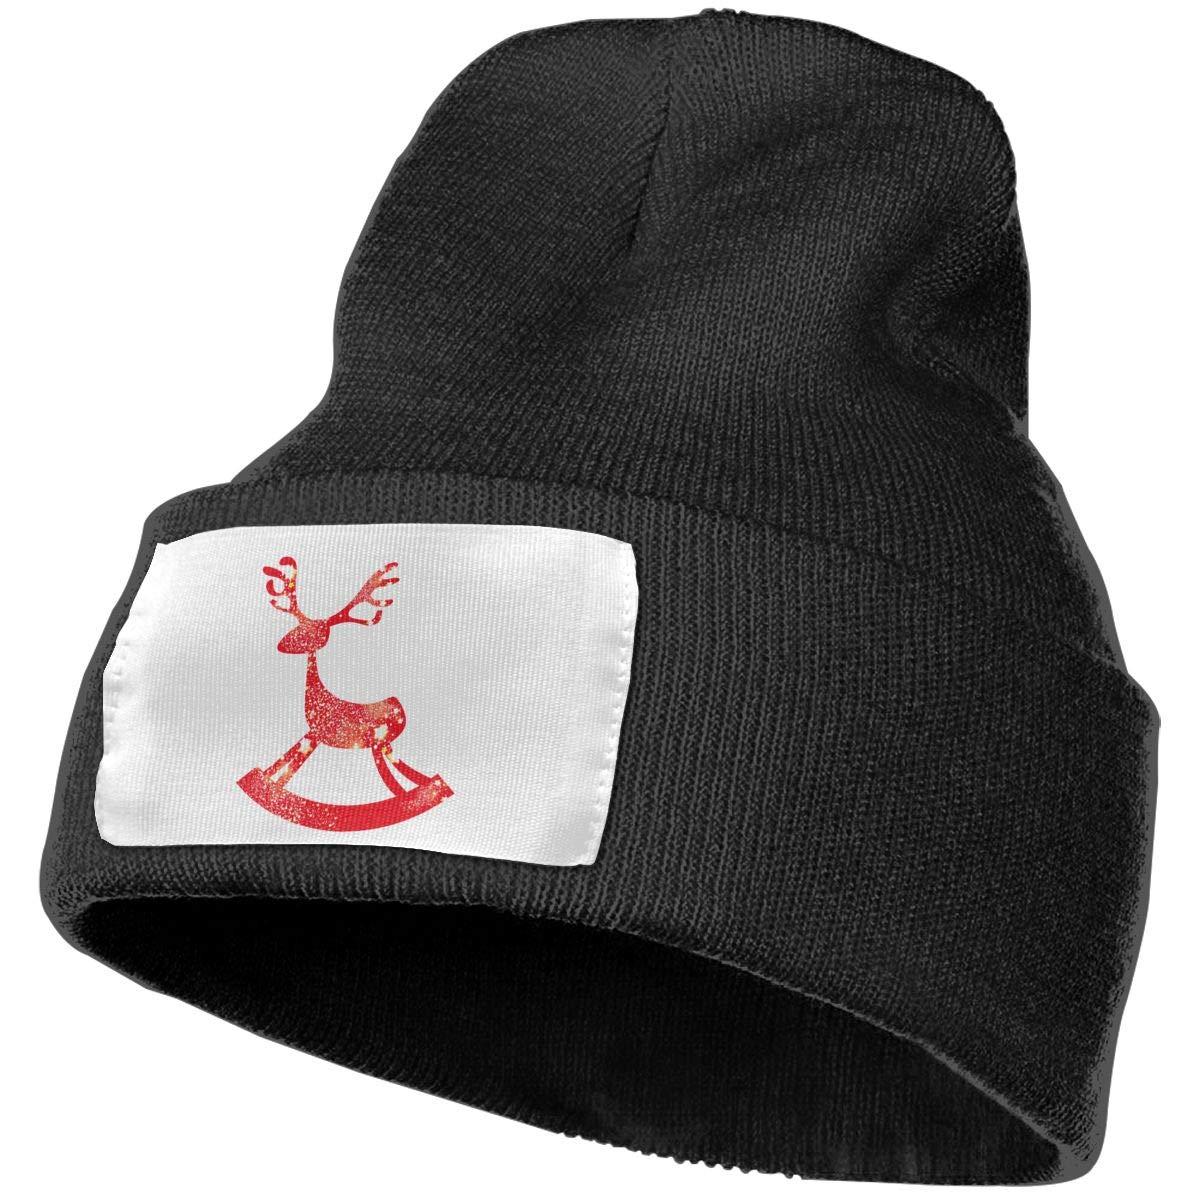 Amazon.com  Reindeer Unisex Knit Hat Cap Soft Warm Winter Hat Beanie Skull Caps  Winter Gift  Clothing 57d3f7df7b3